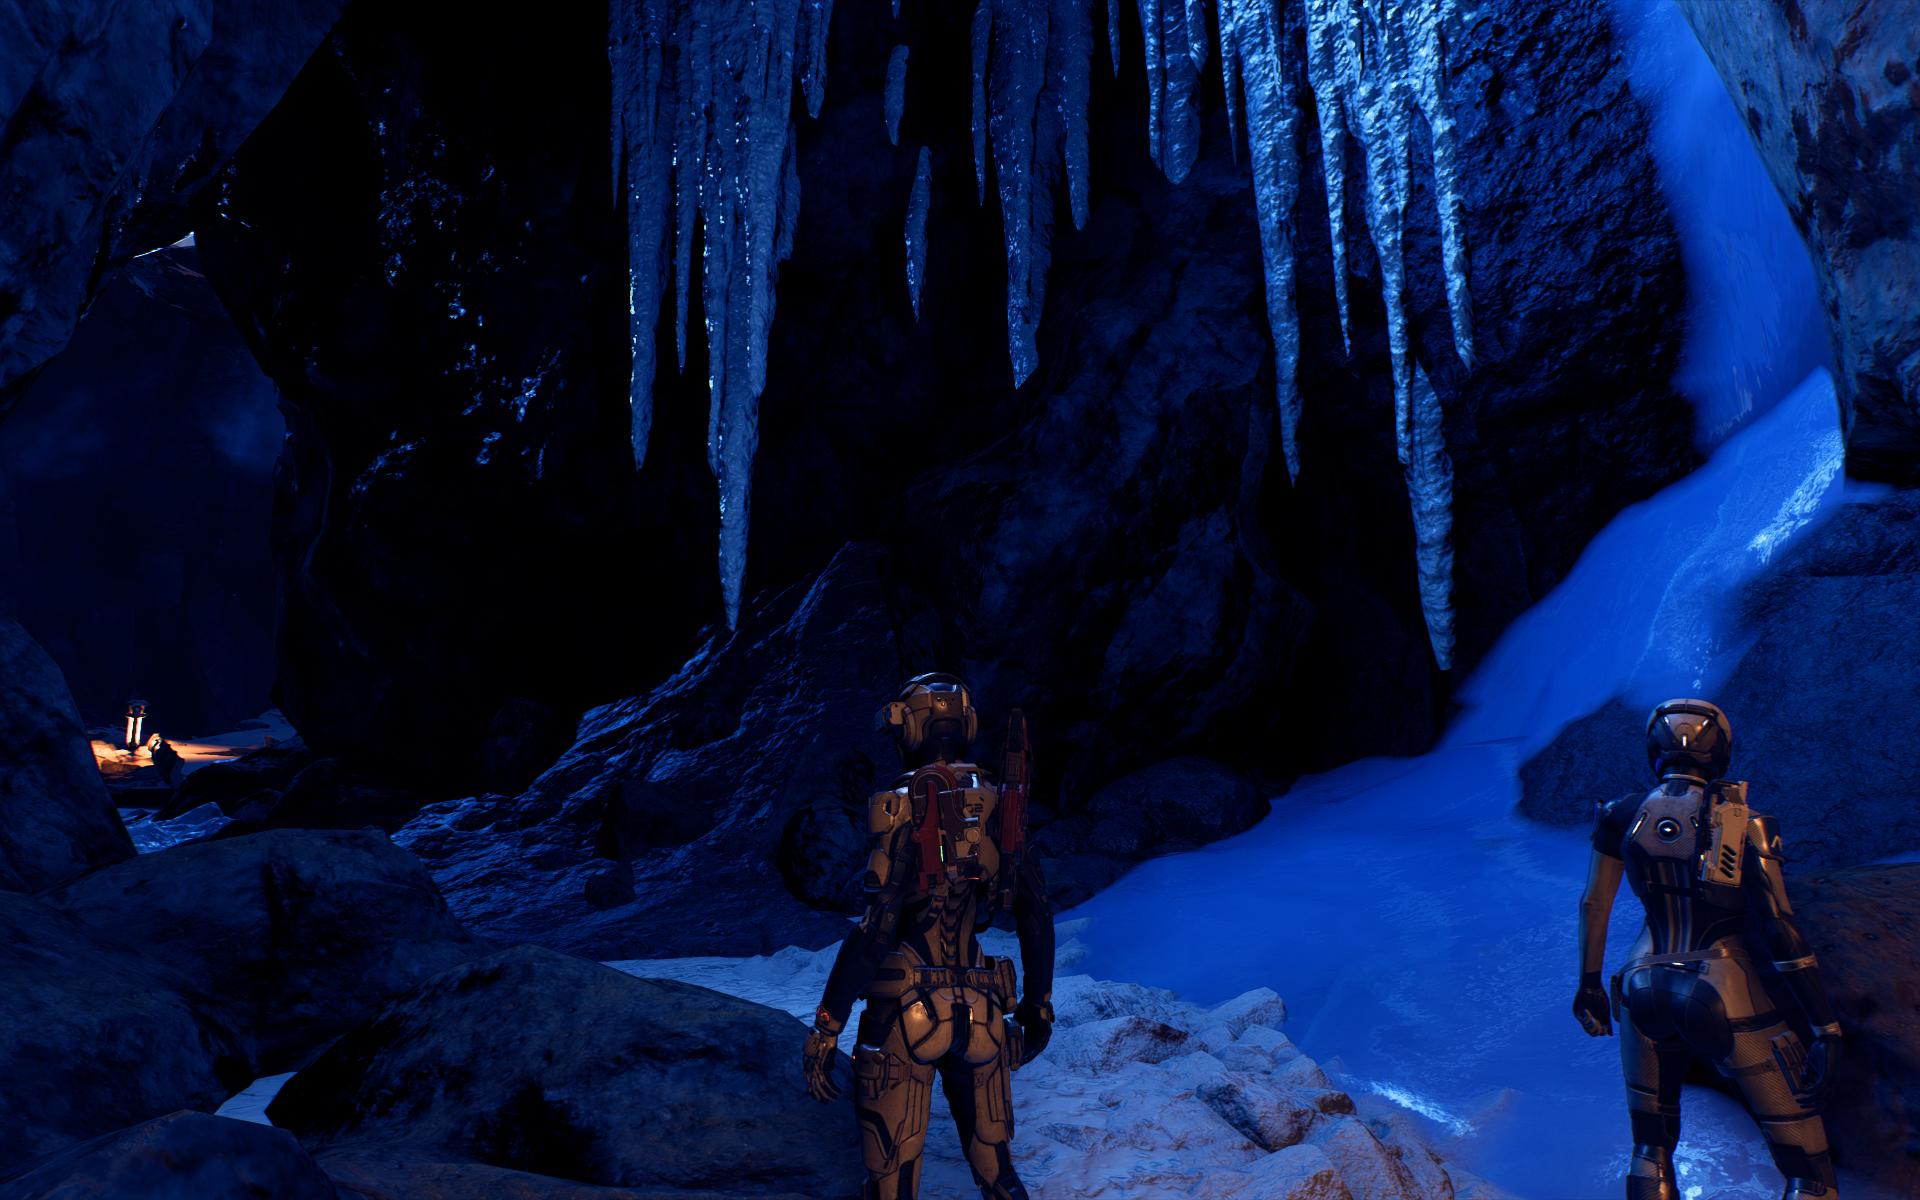 Mass Effect Andromeda Screenshot  - 19.39.27.45.png - Mass Effect: Andromeda